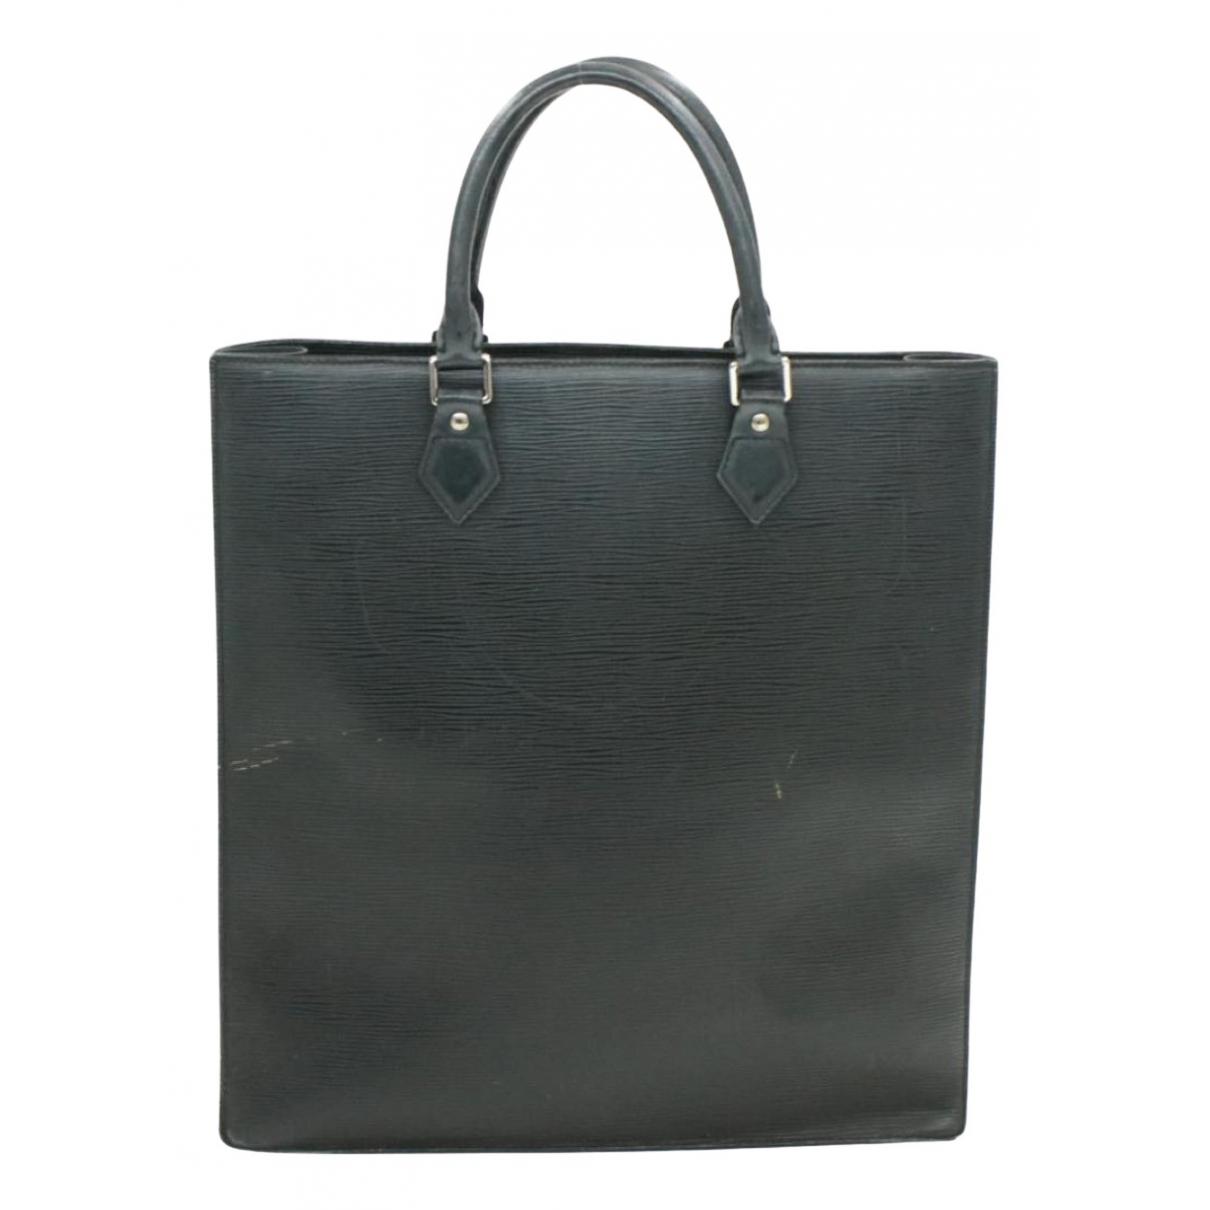 Louis Vuitton Plat Black Leather handbag for Women N